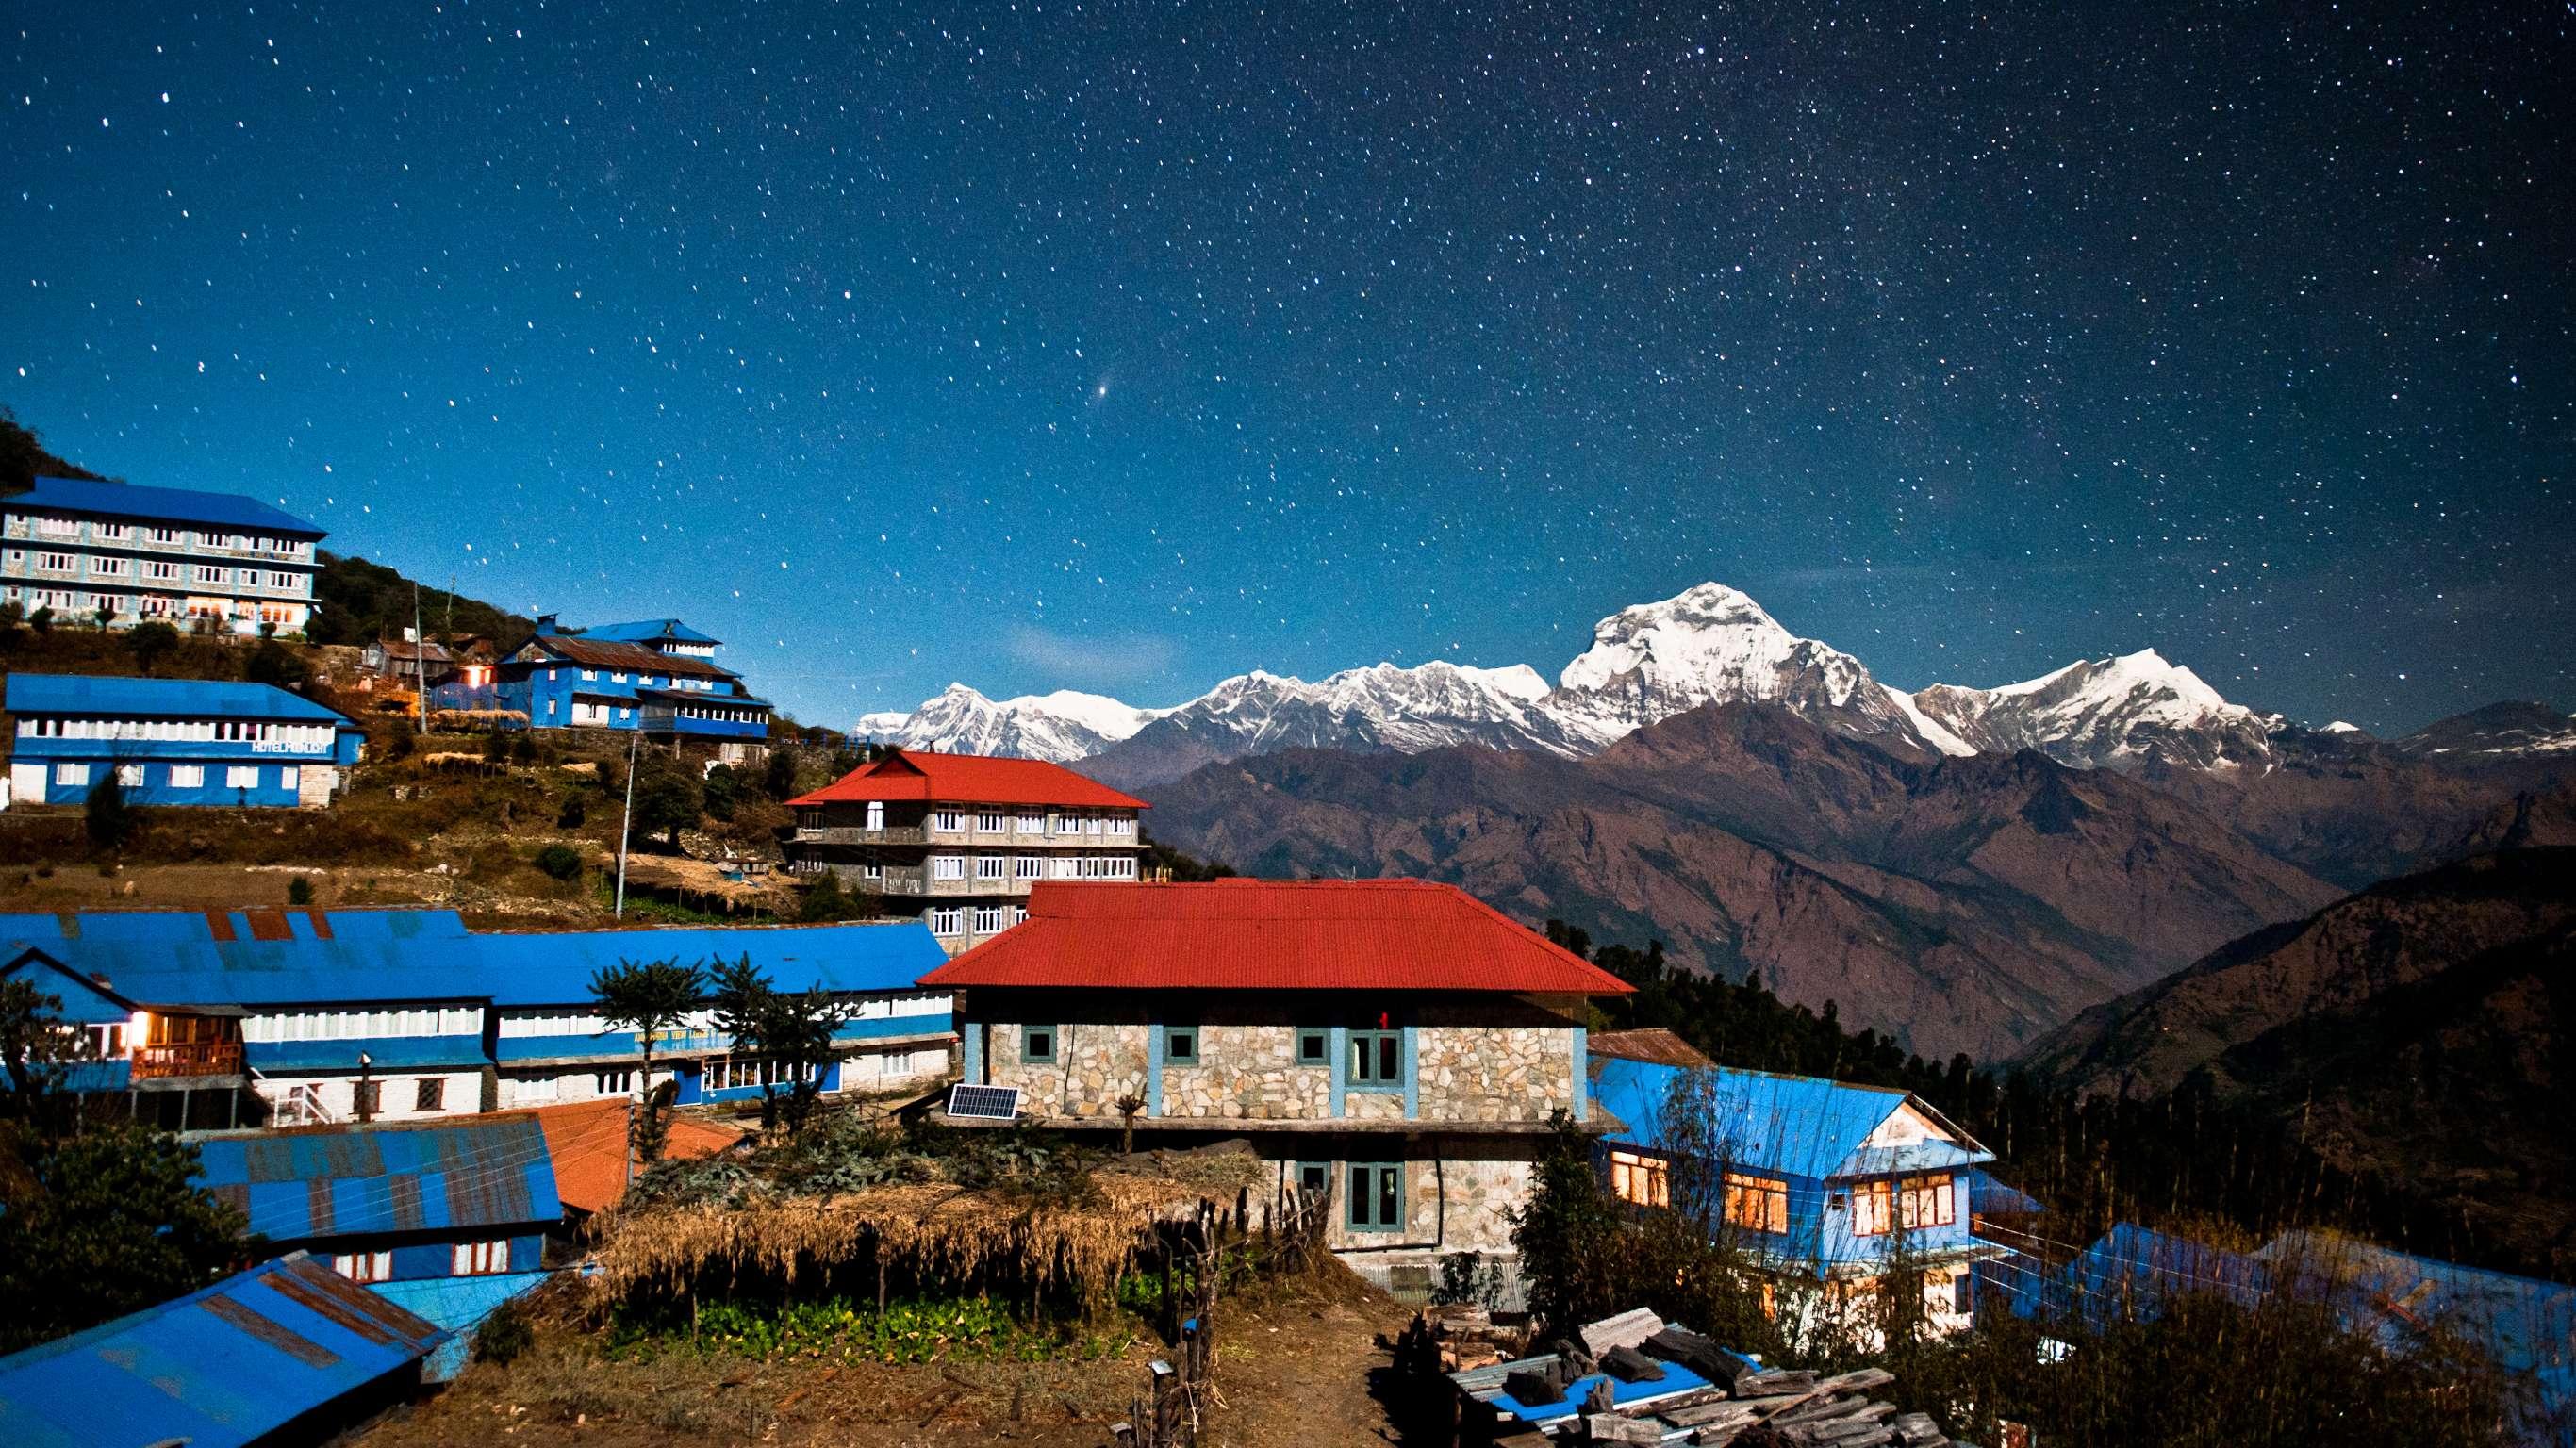 5-Day Poonhill Trek - Nepal Itinerary